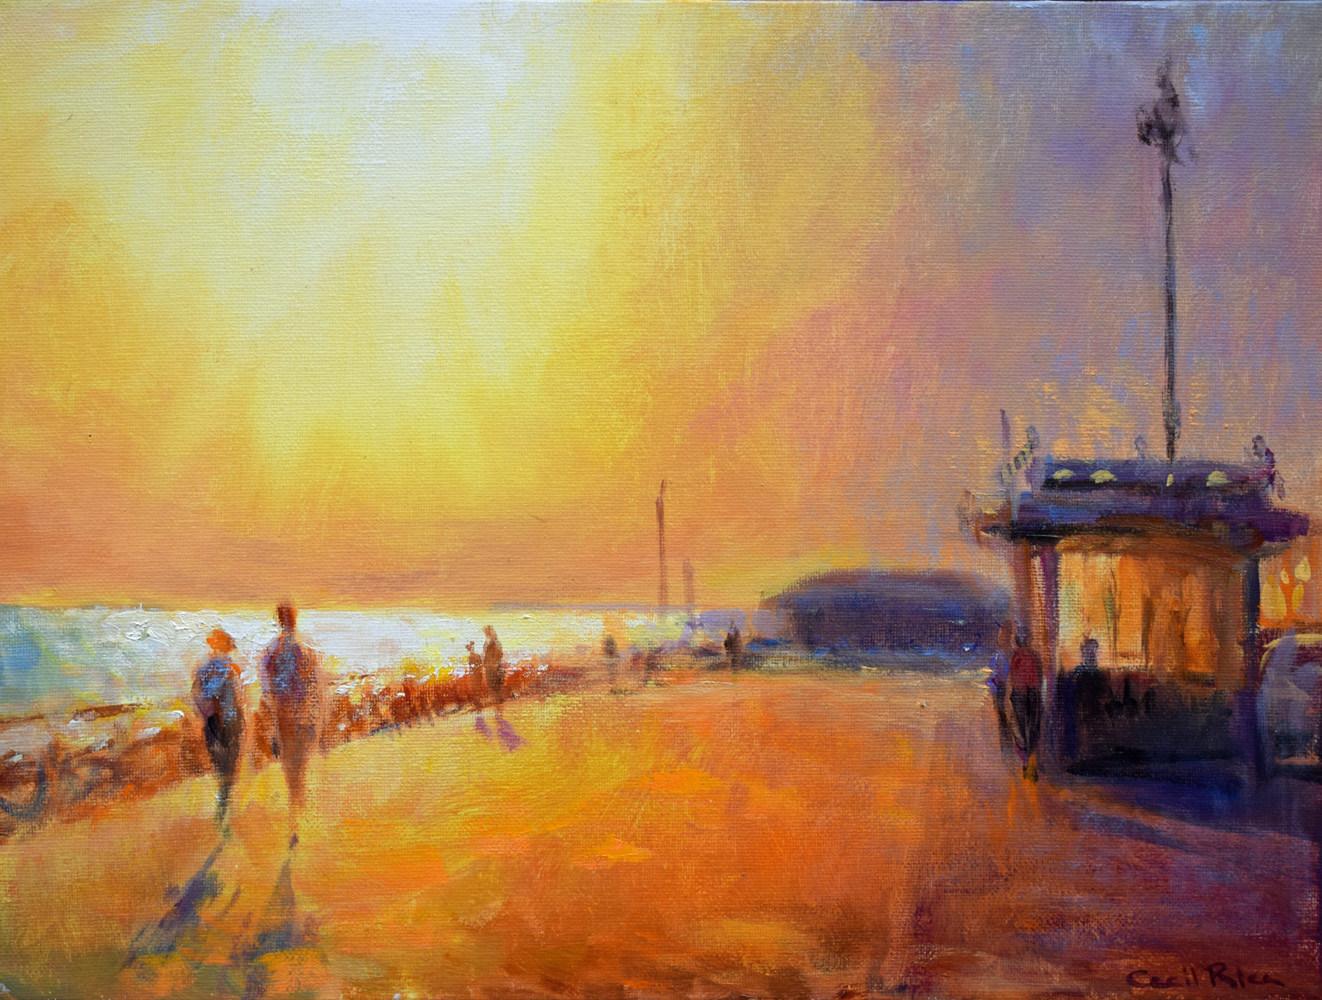 Hove Esplanade at Sunset